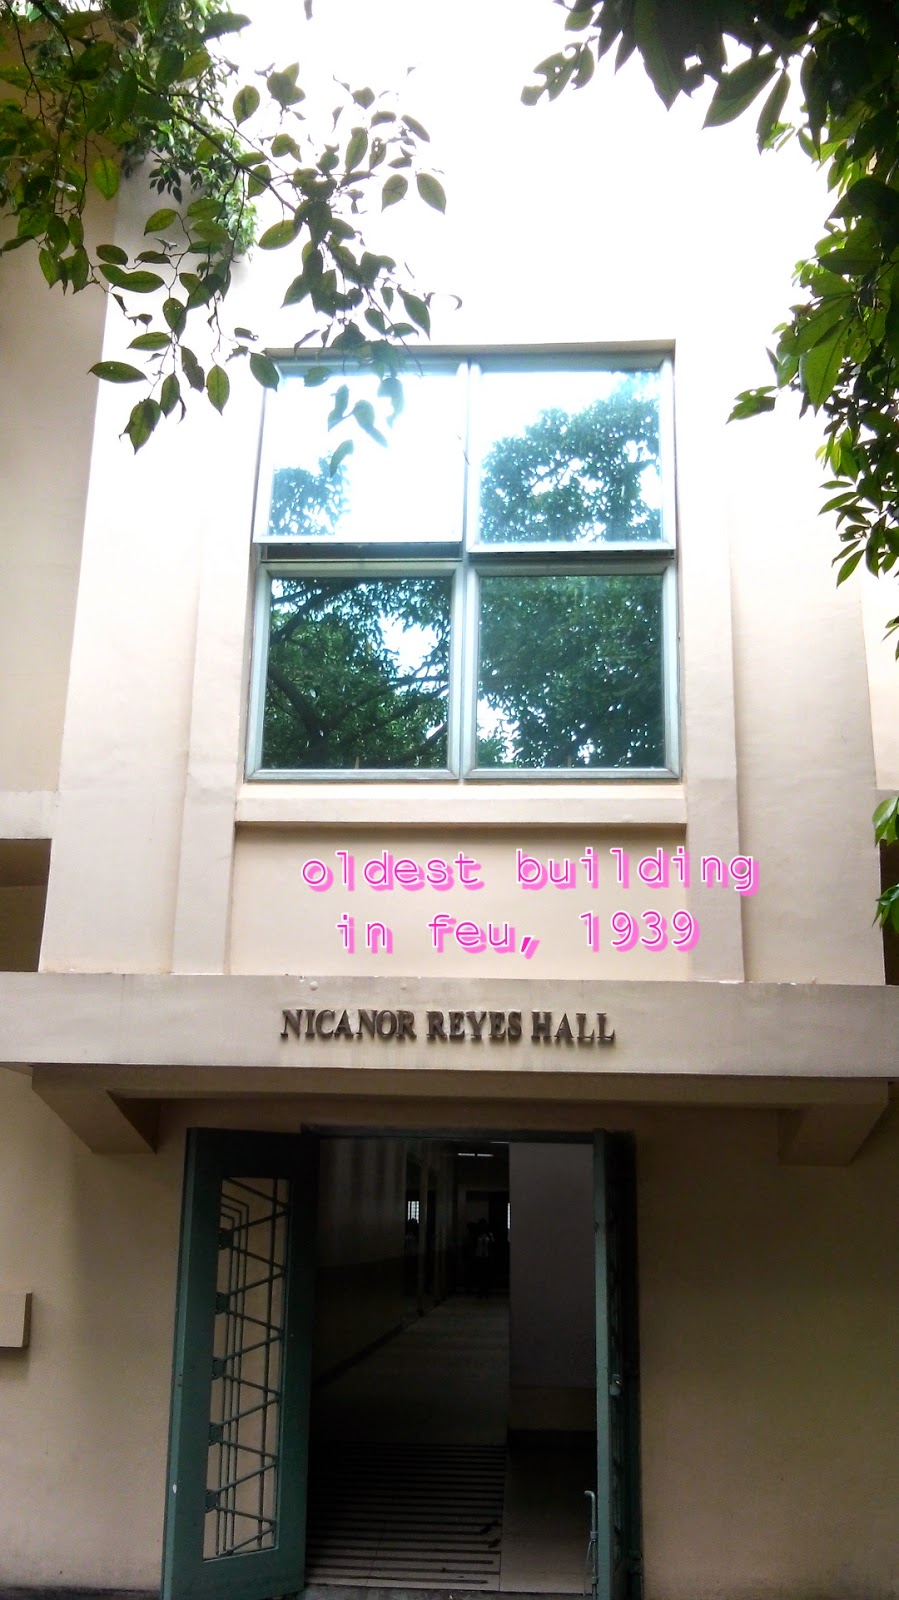 Oldest building in FEU nicanor reyes